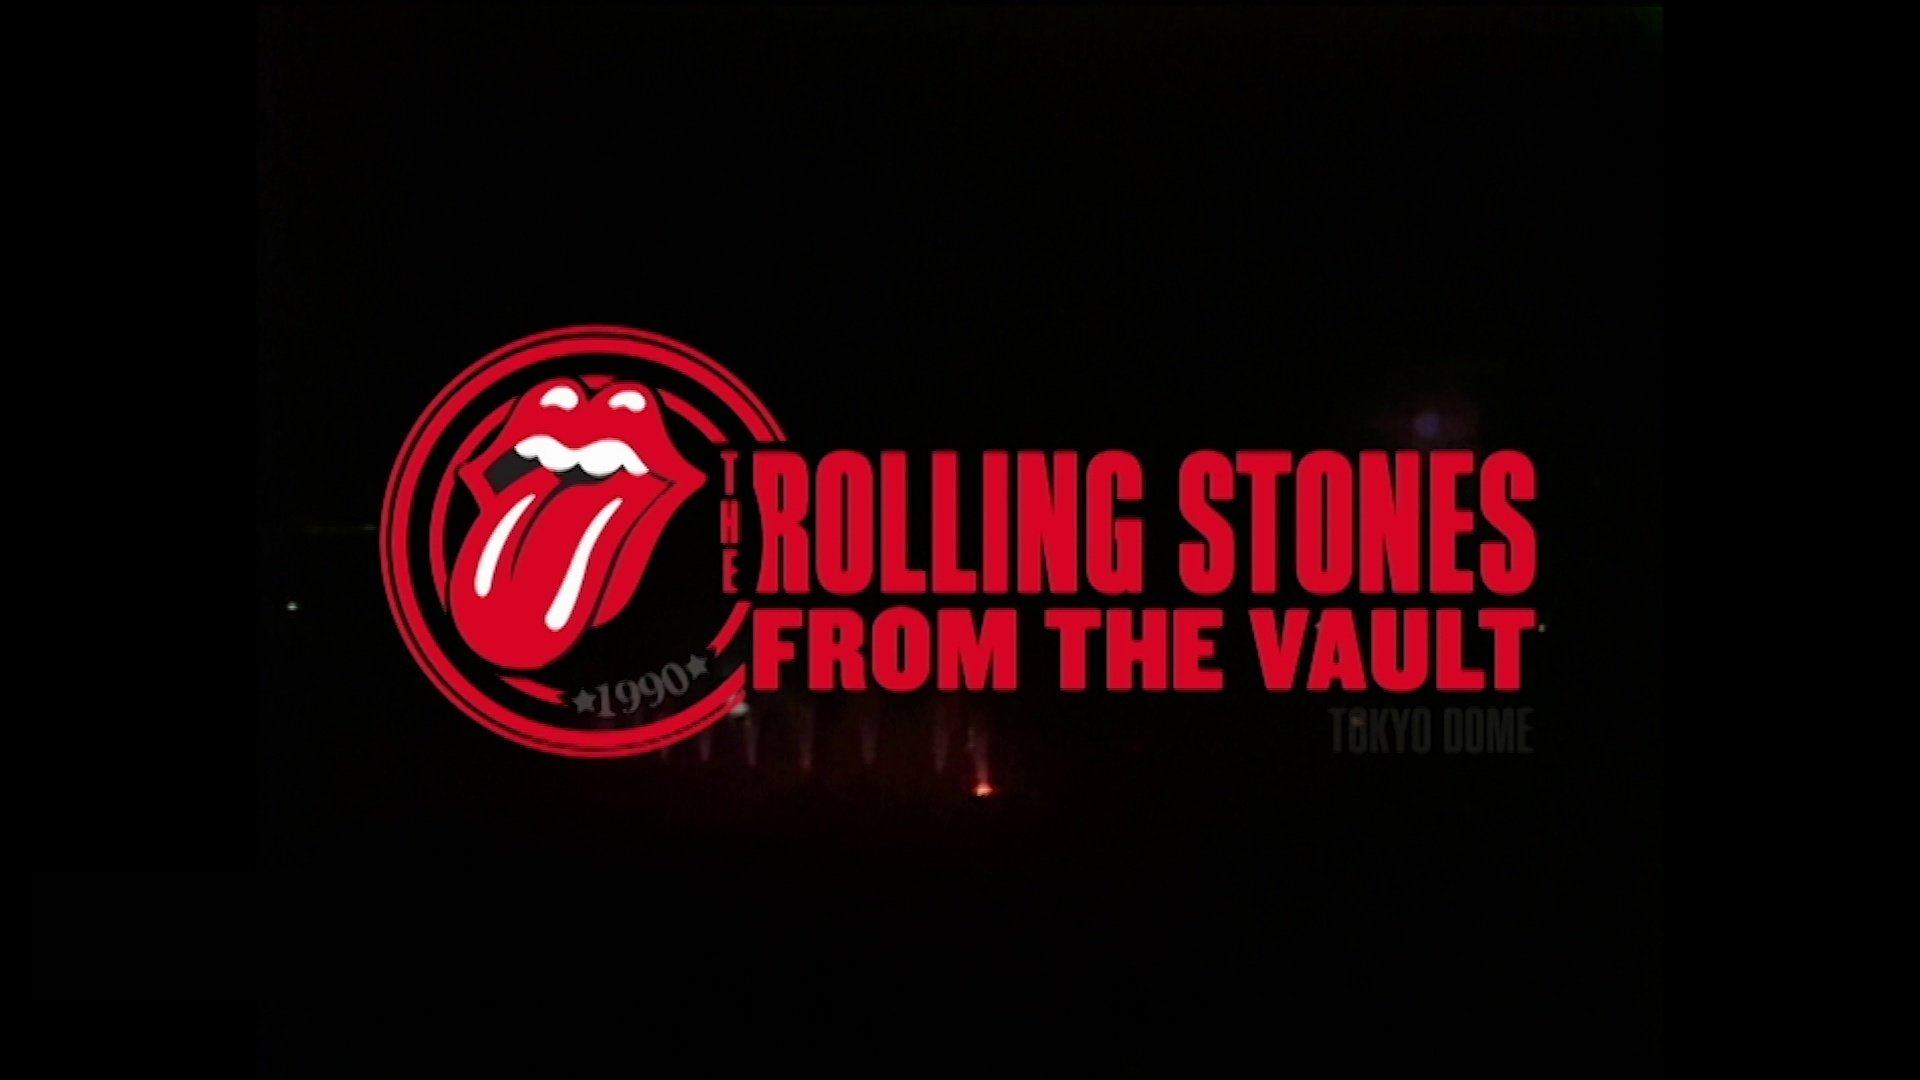 Download Hd 1080p The Rolling Stones Desktop Wallpaper Id 402426 For